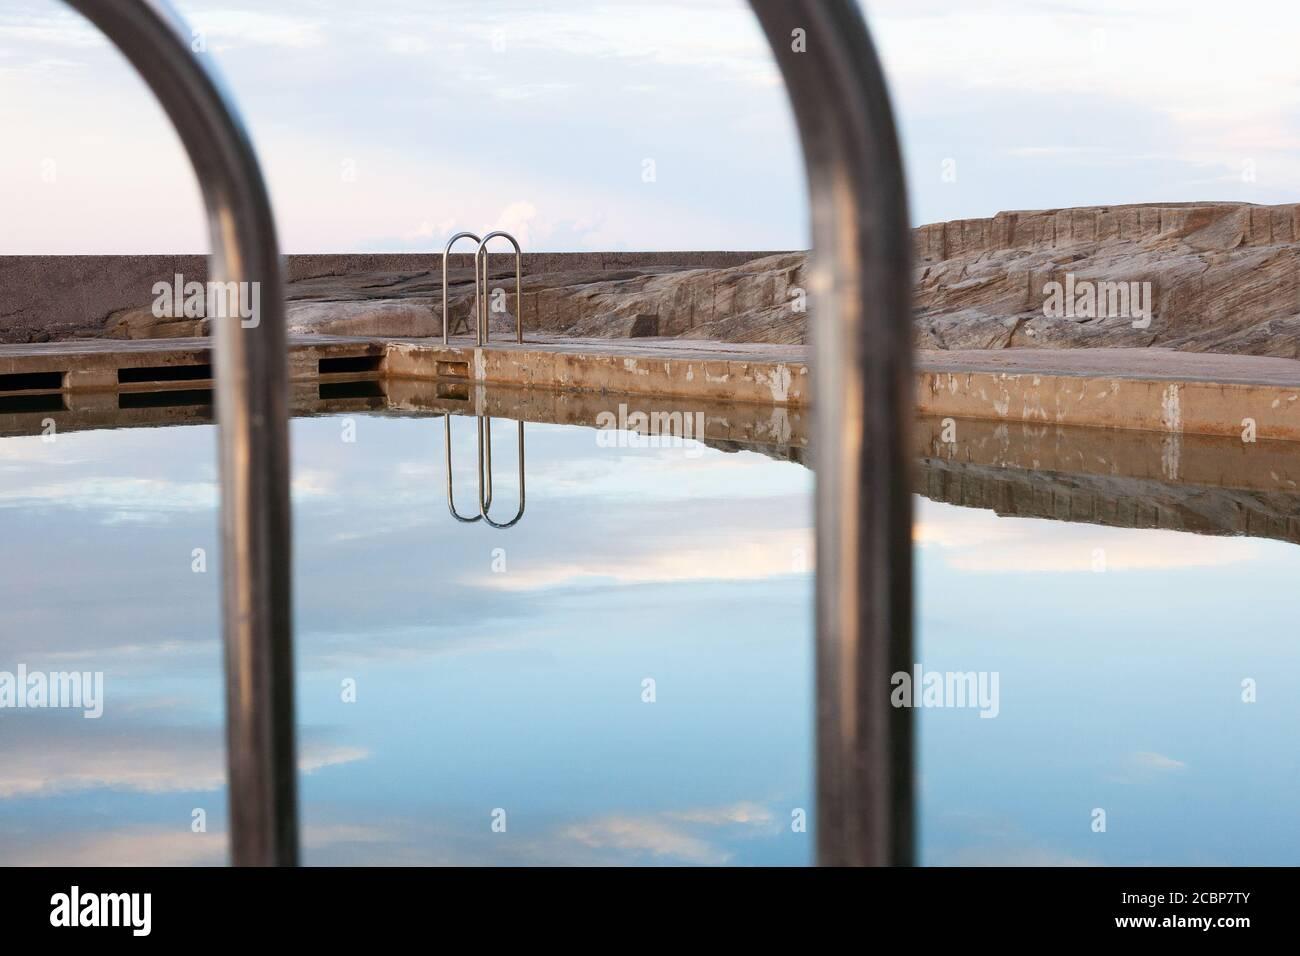 Refections at the Ocean Pool, Yamba, Nouvelle-Galles du Sud, Australie Banque D'Images